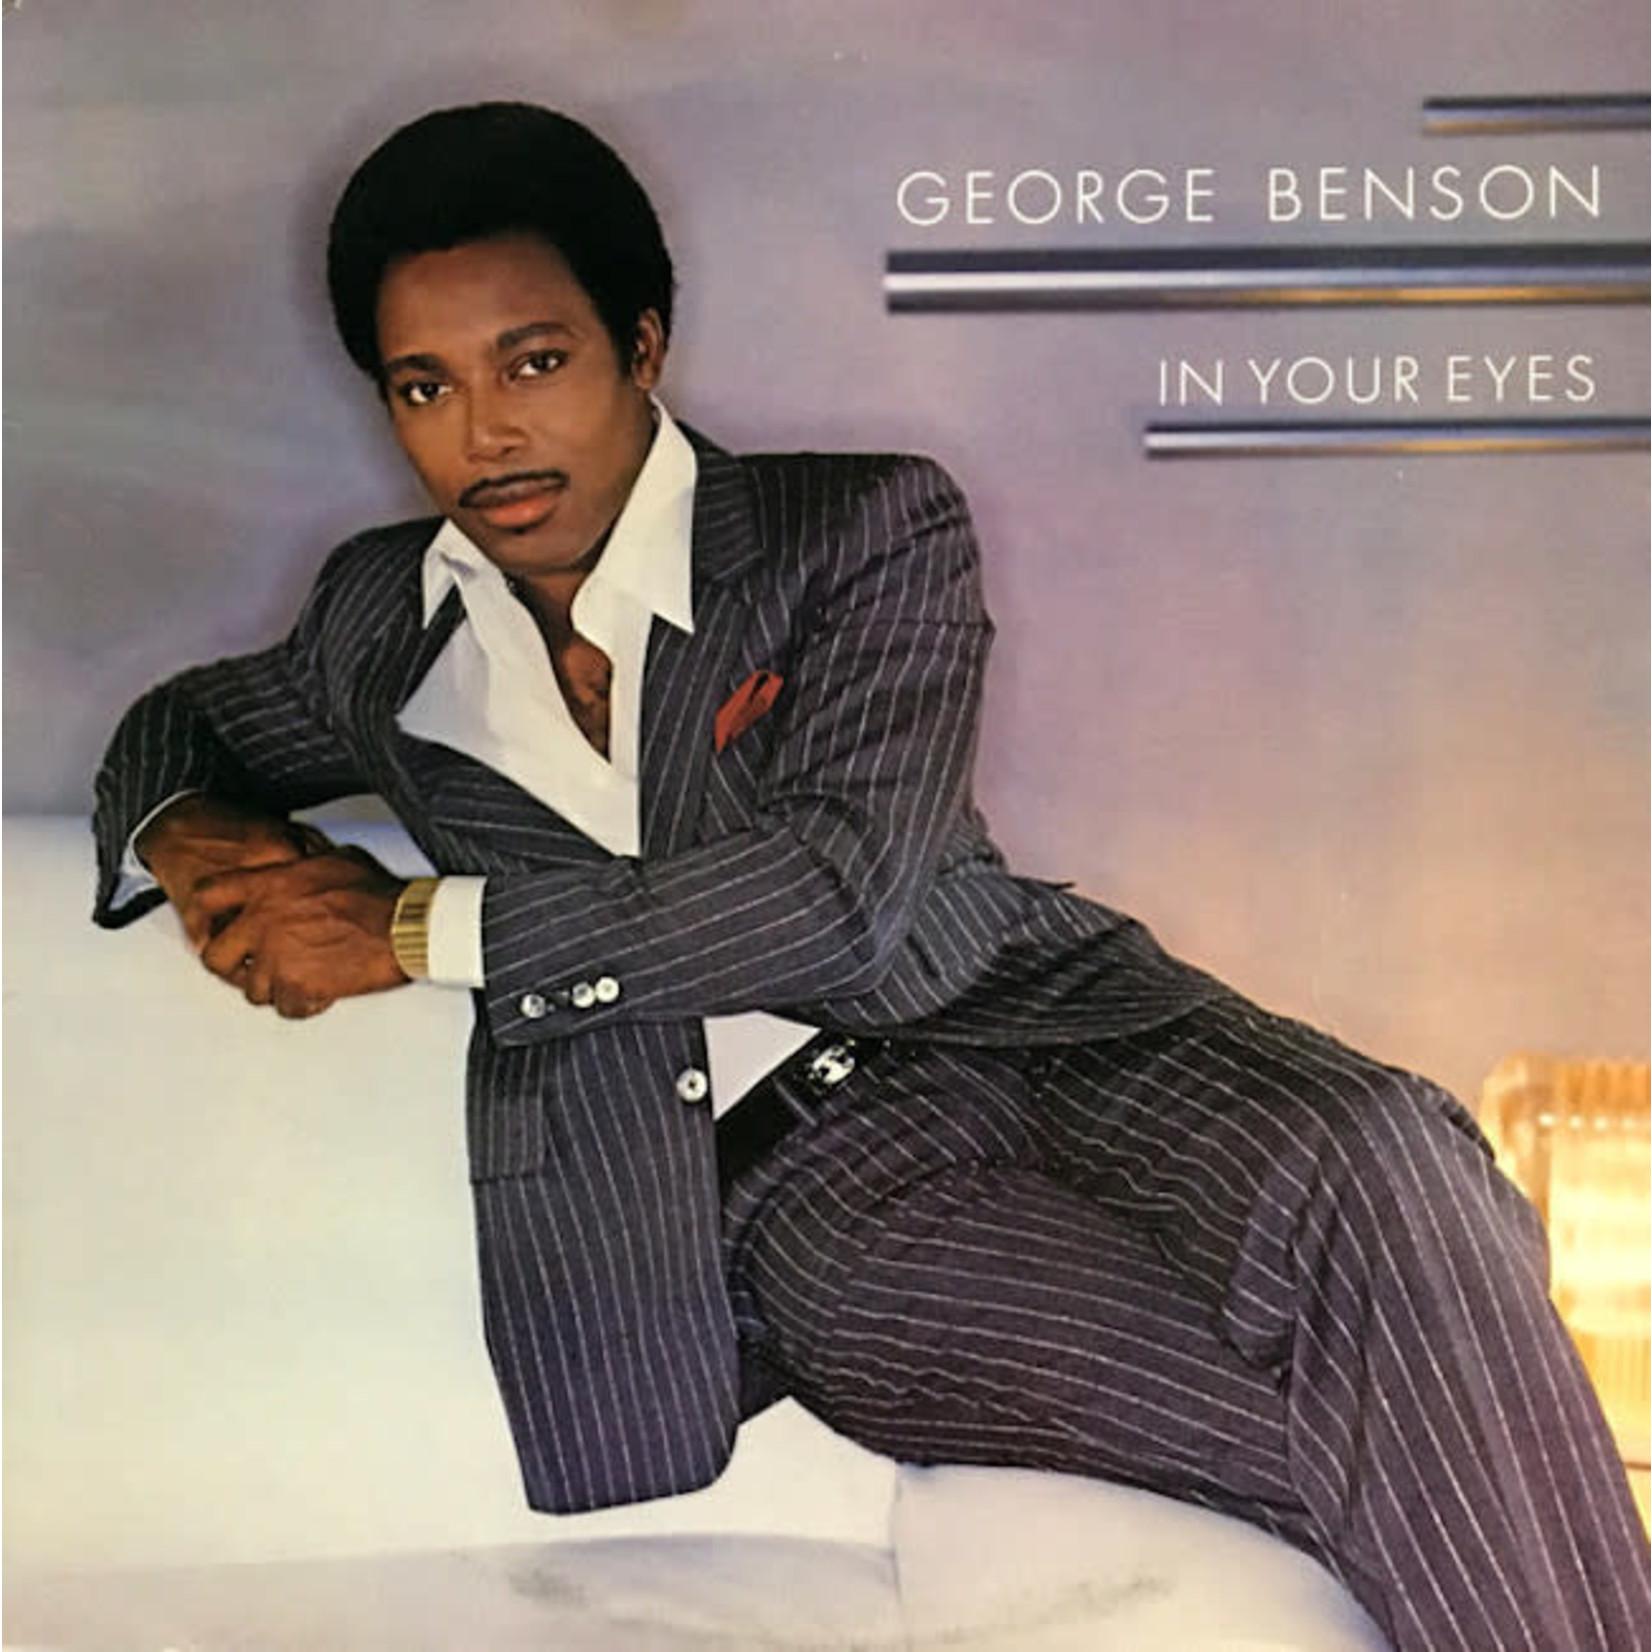 [Vintage] Benson, George: In Your Eyes